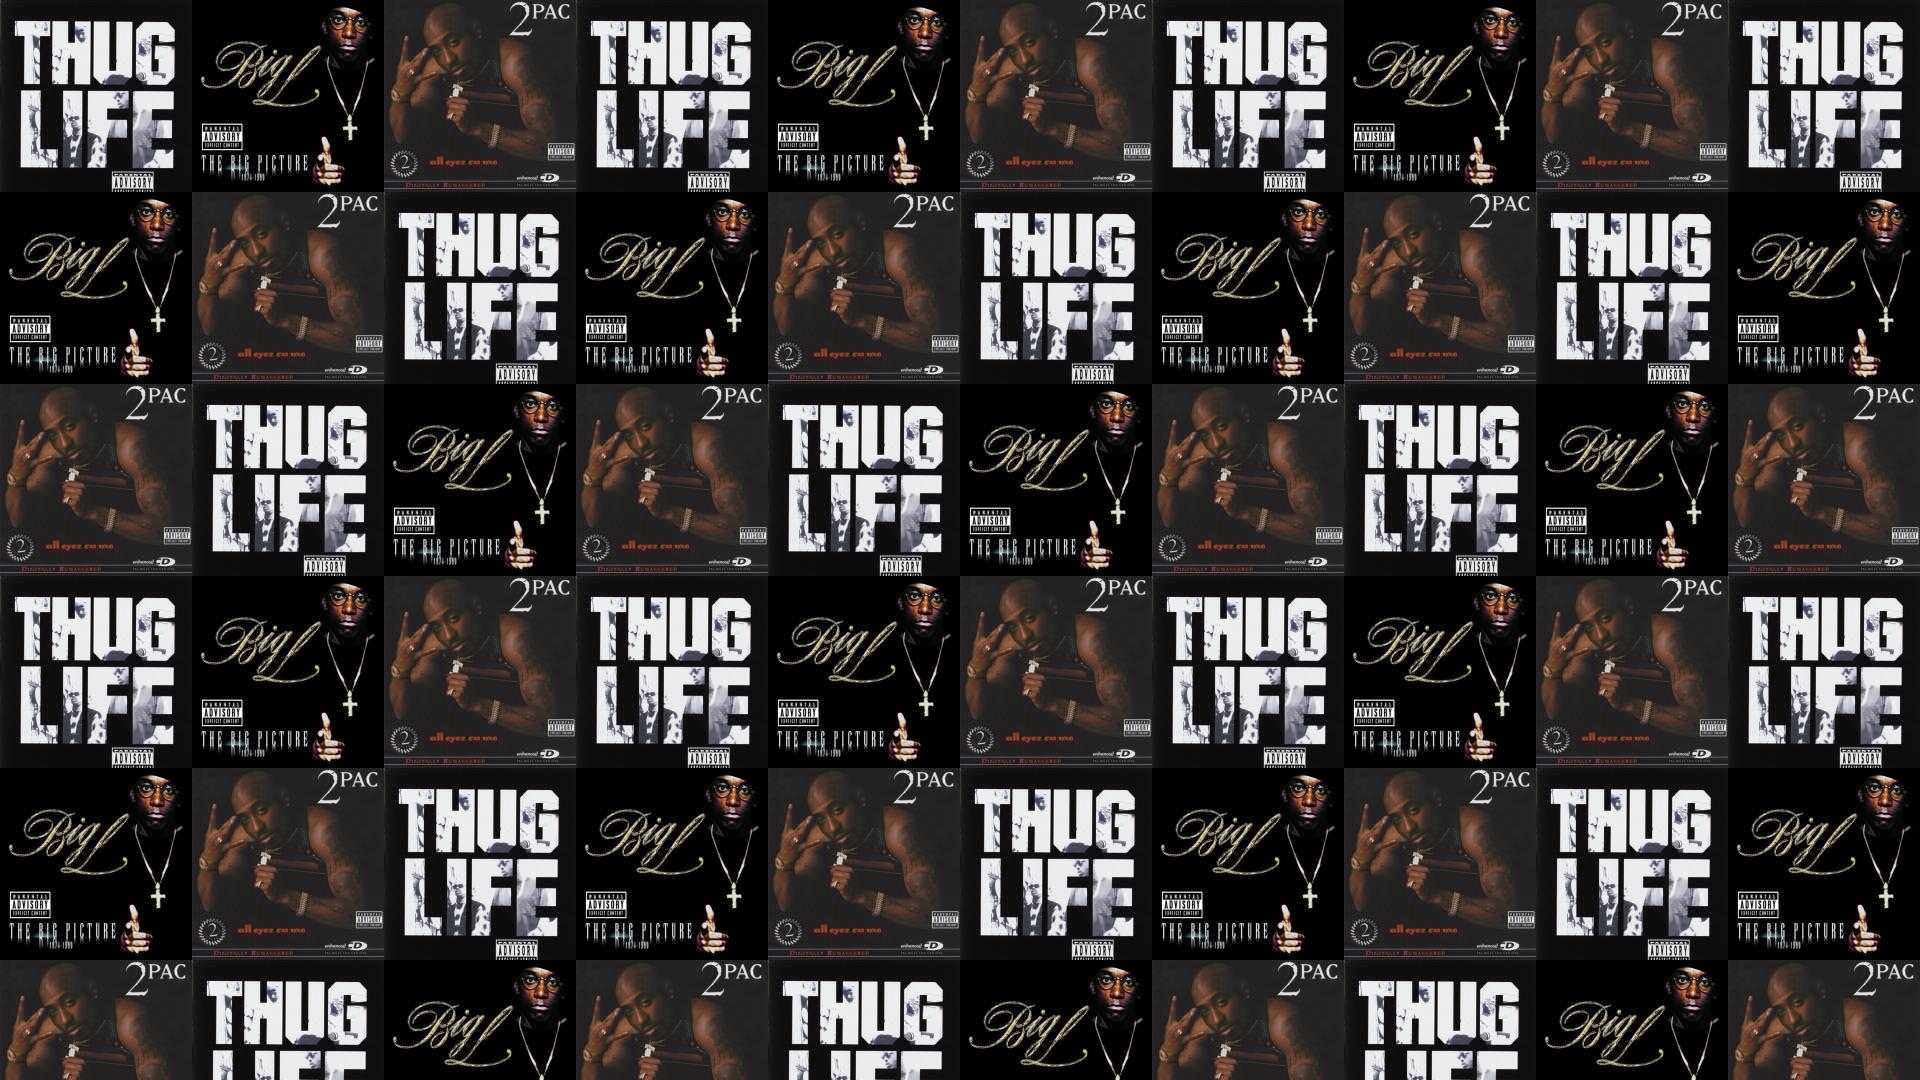 2pac Thug Life Big L The Picture Wallpaper Tiled Desktop